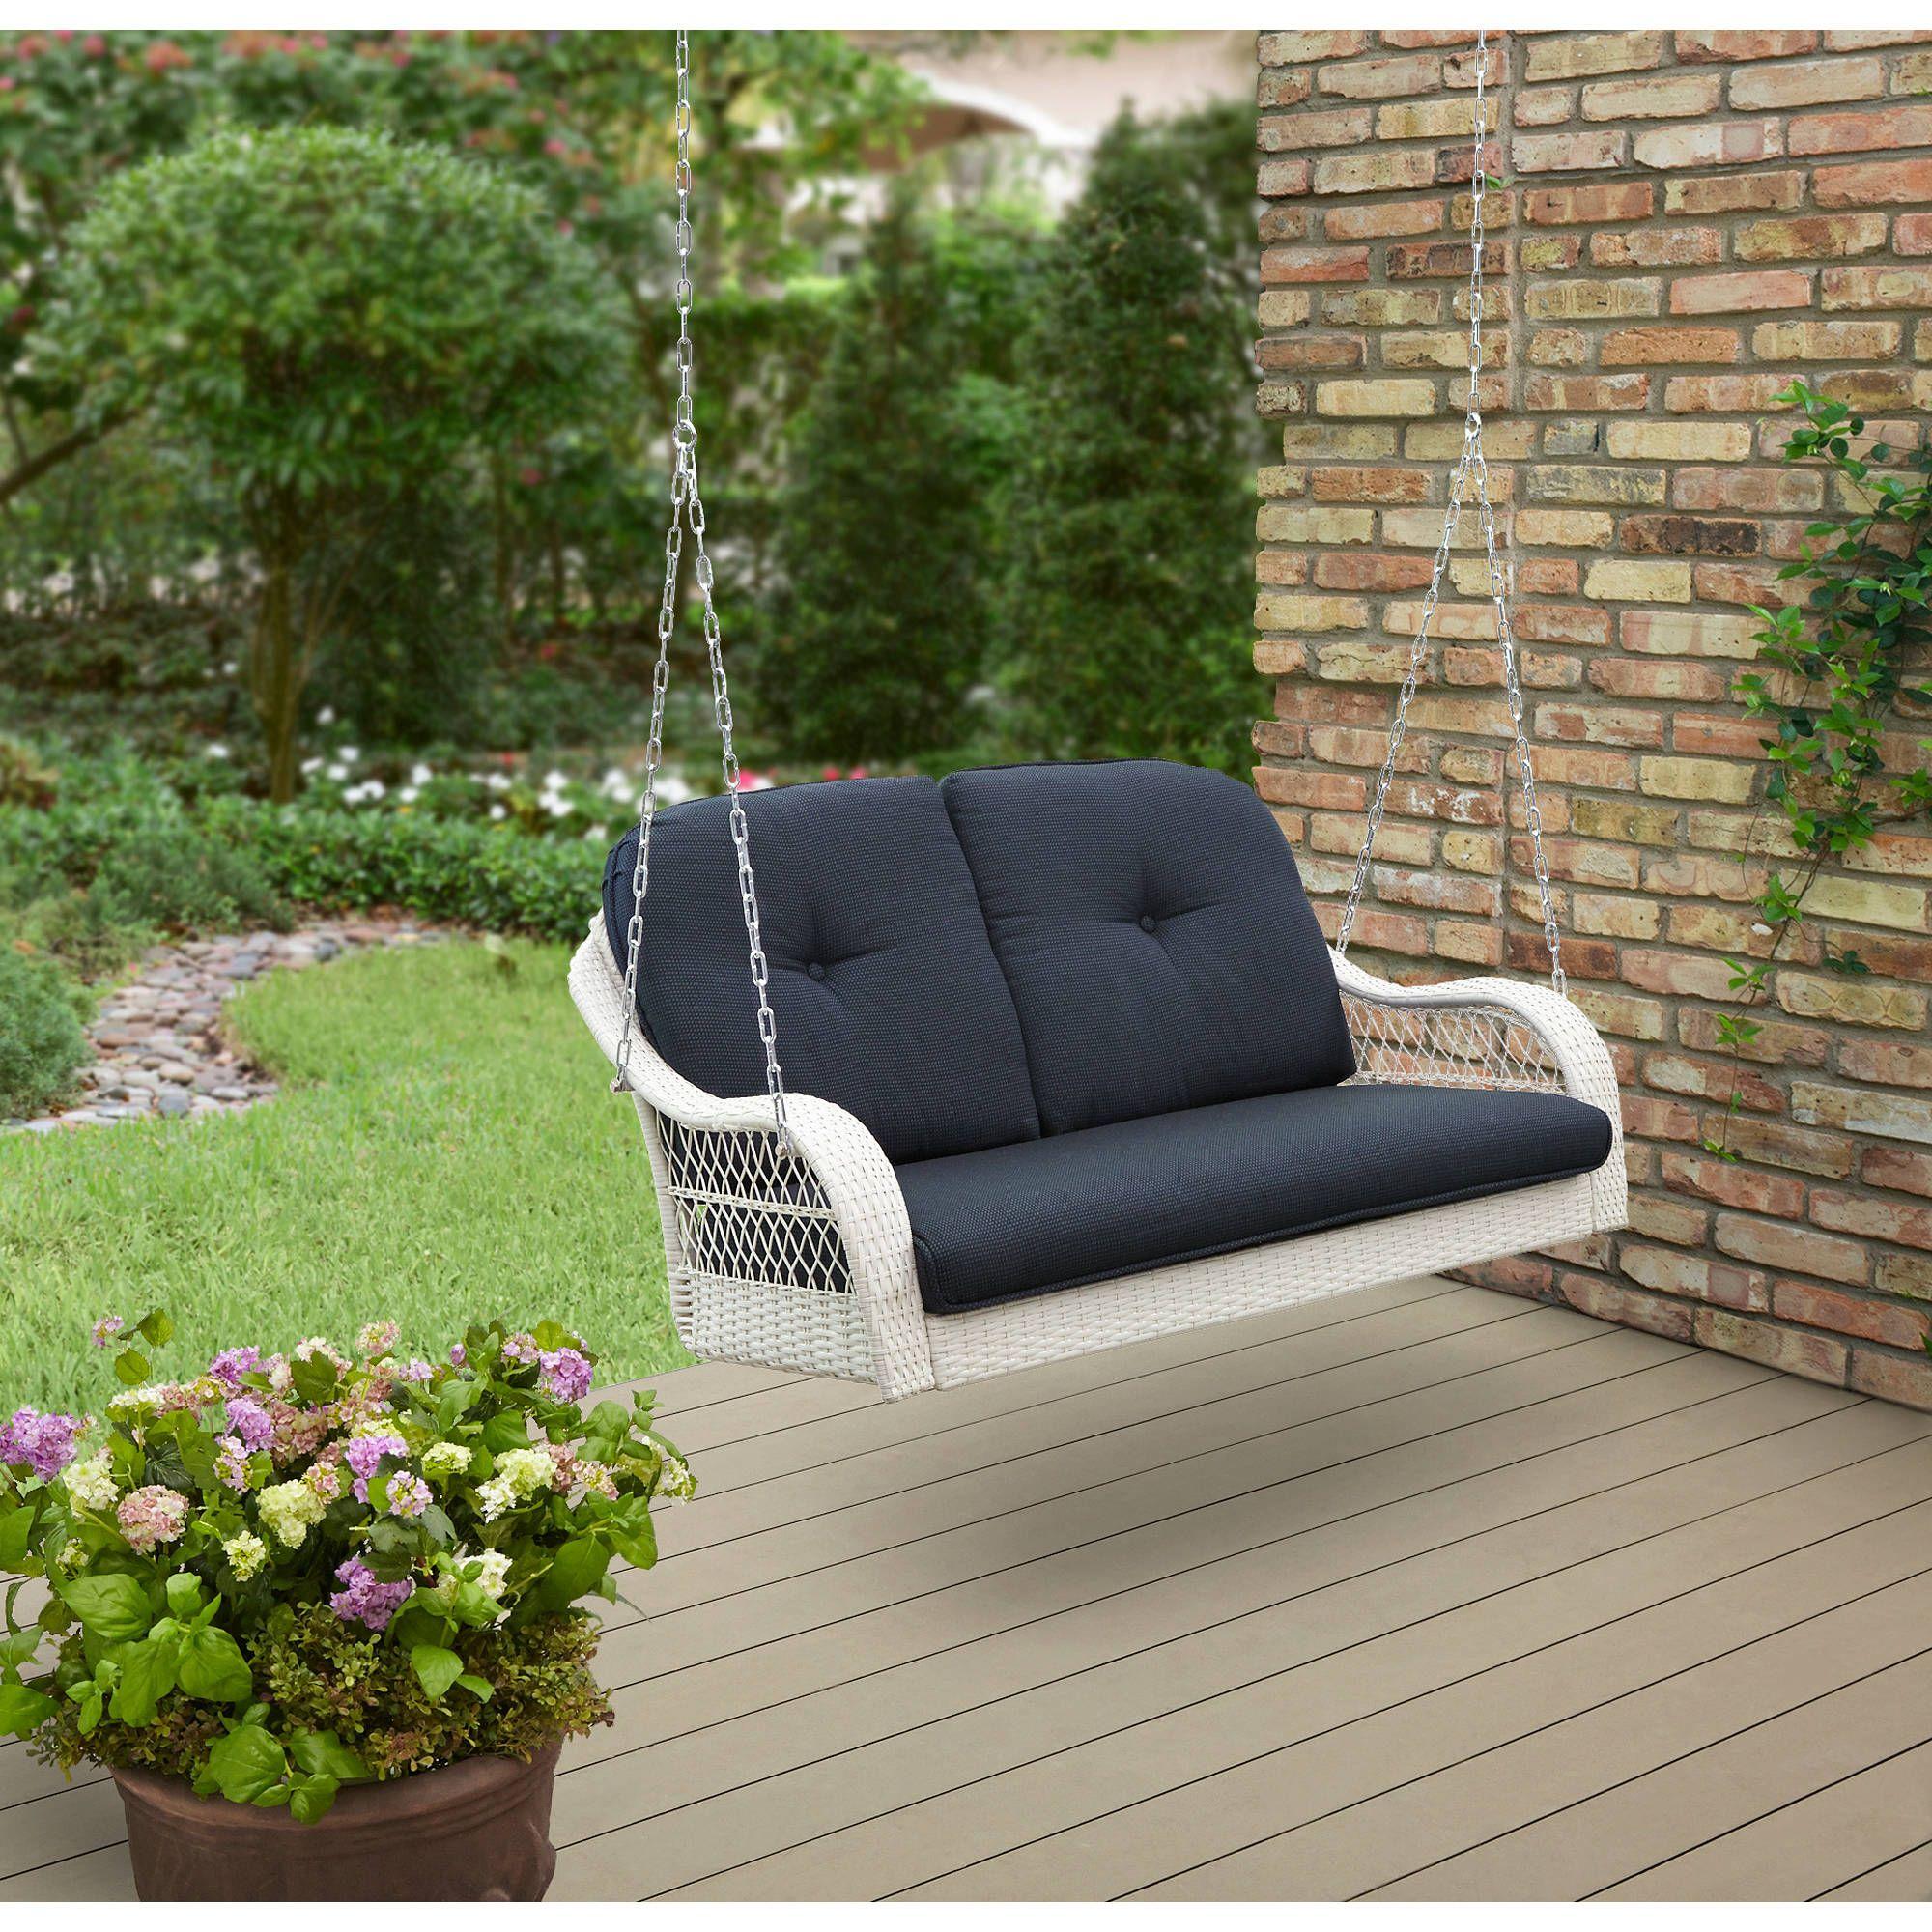 ac9184b2b1d31903b7188ef7705d4301 - Better Homes And Gardens Azalea Ridge Swing